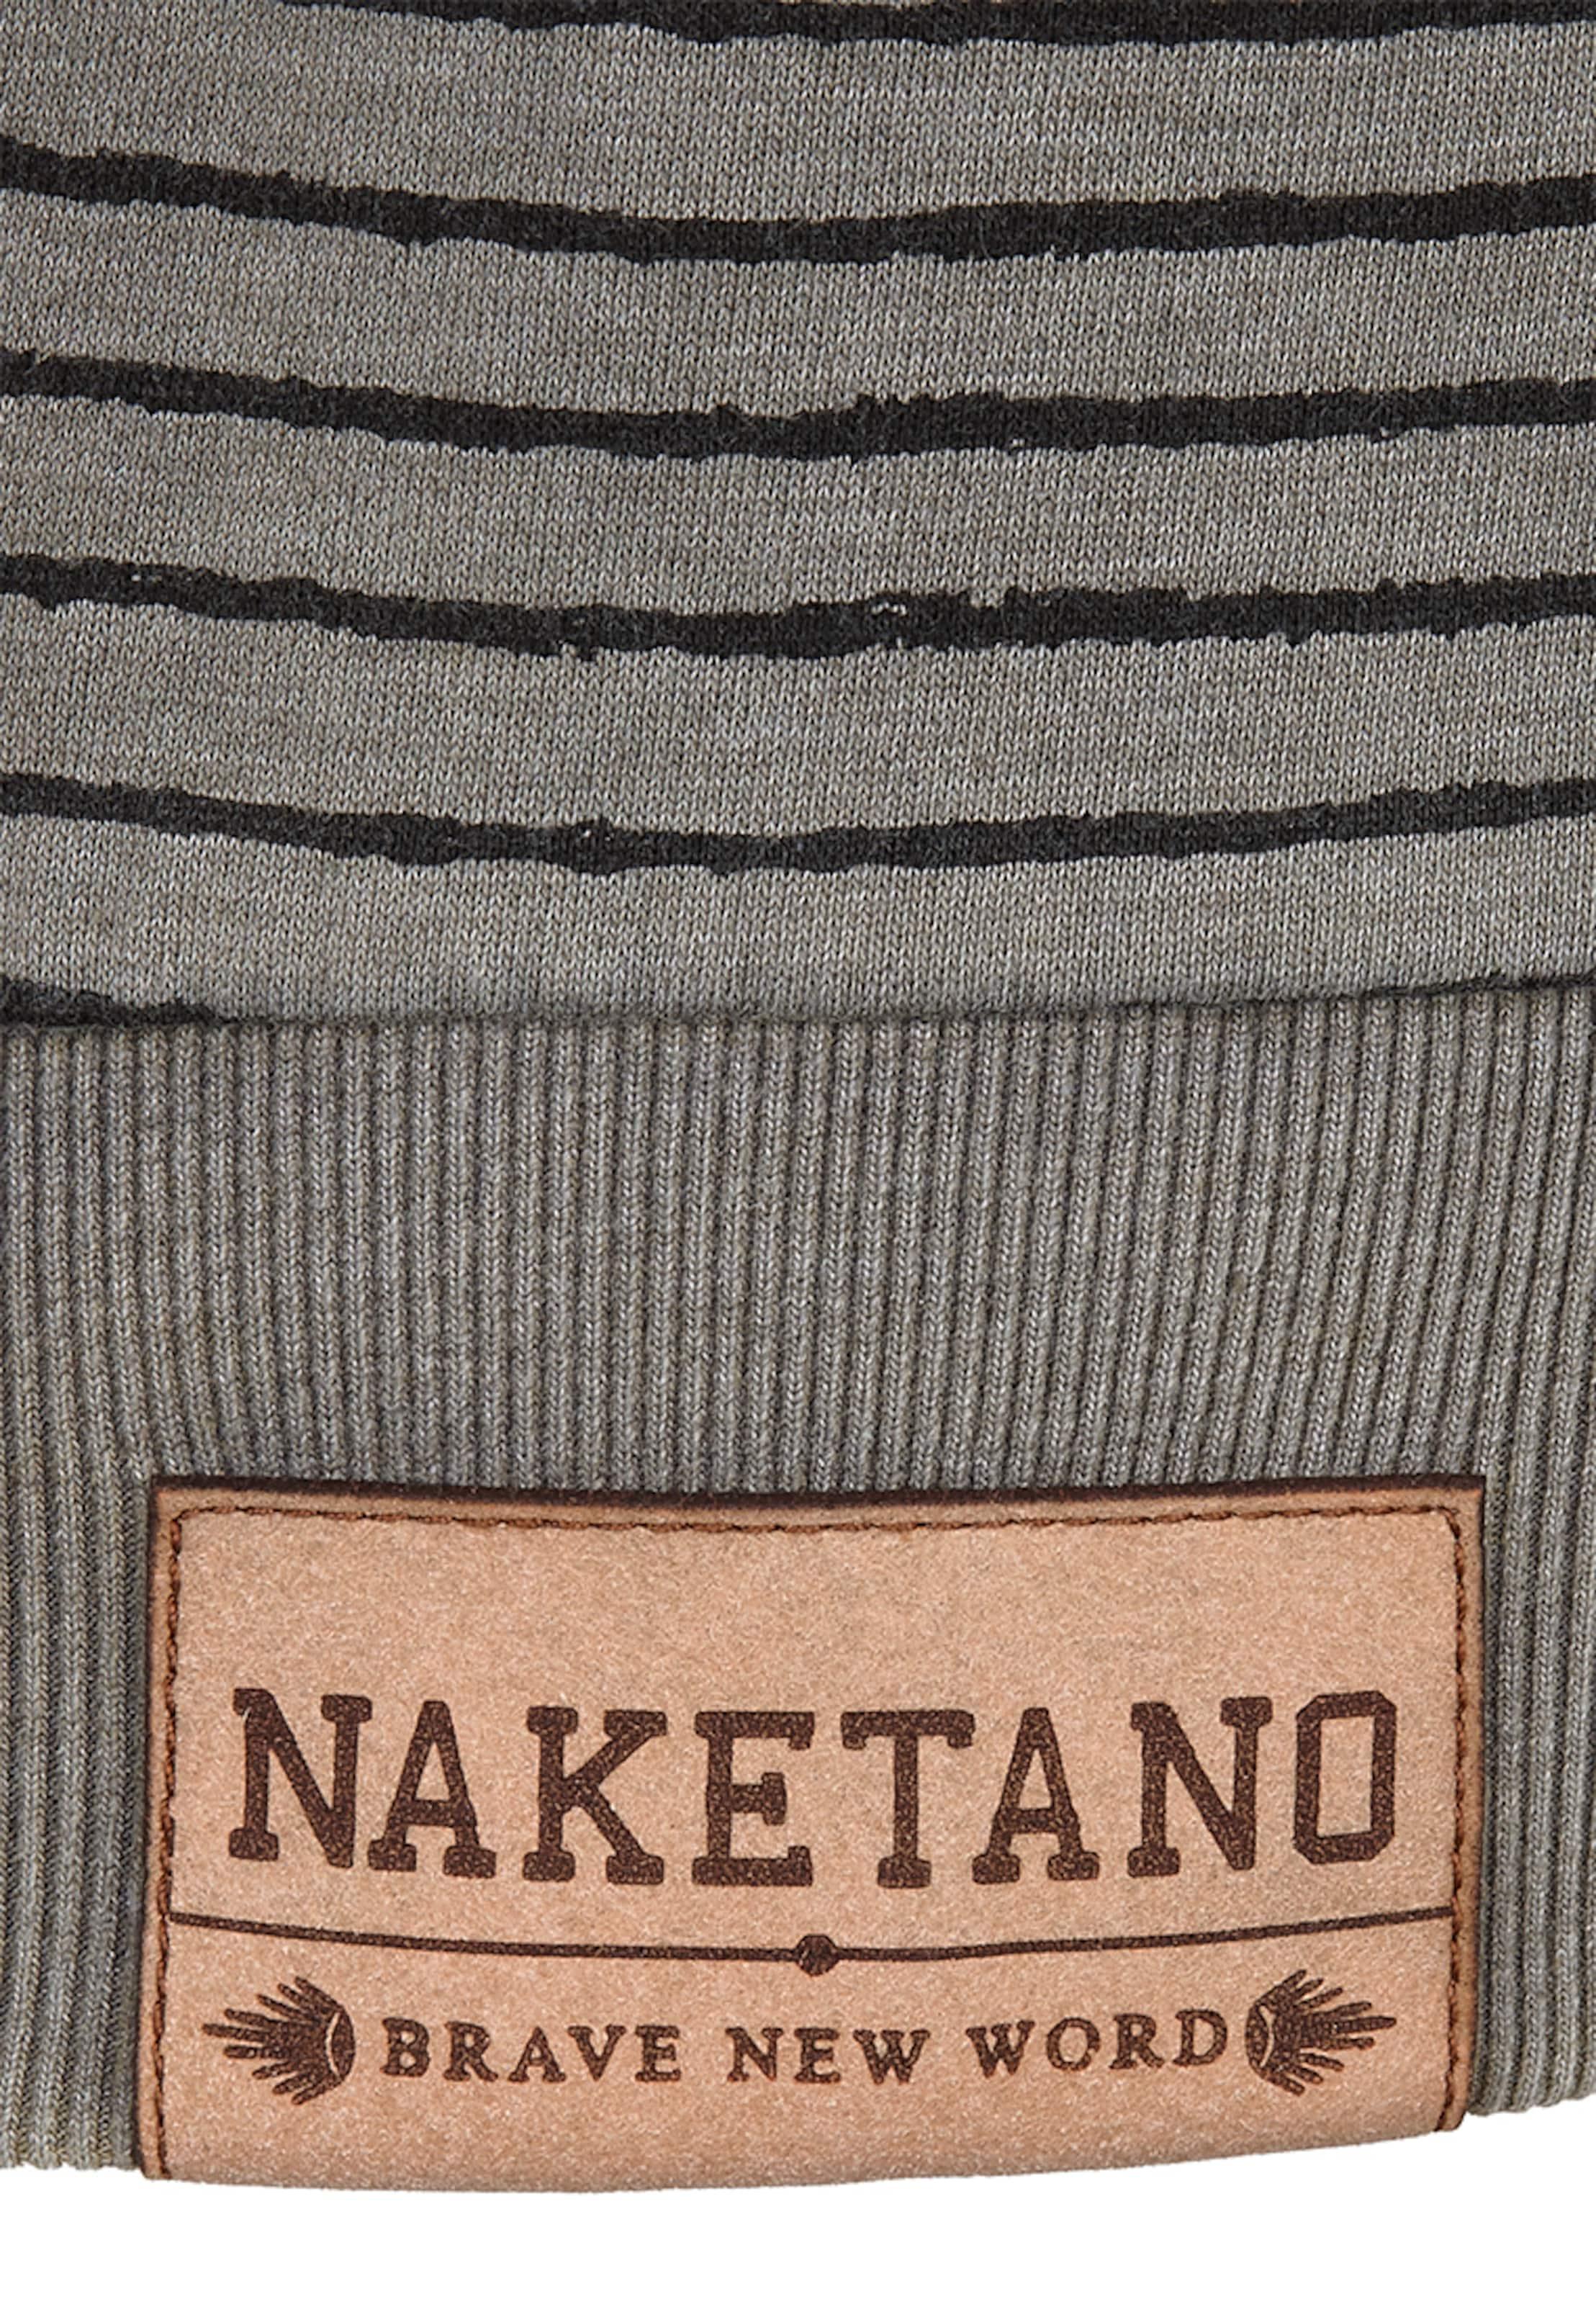 Test' 'death Bleu Sweat shirt Is Our Naketano NuitKaki En Coke tQdCsrh